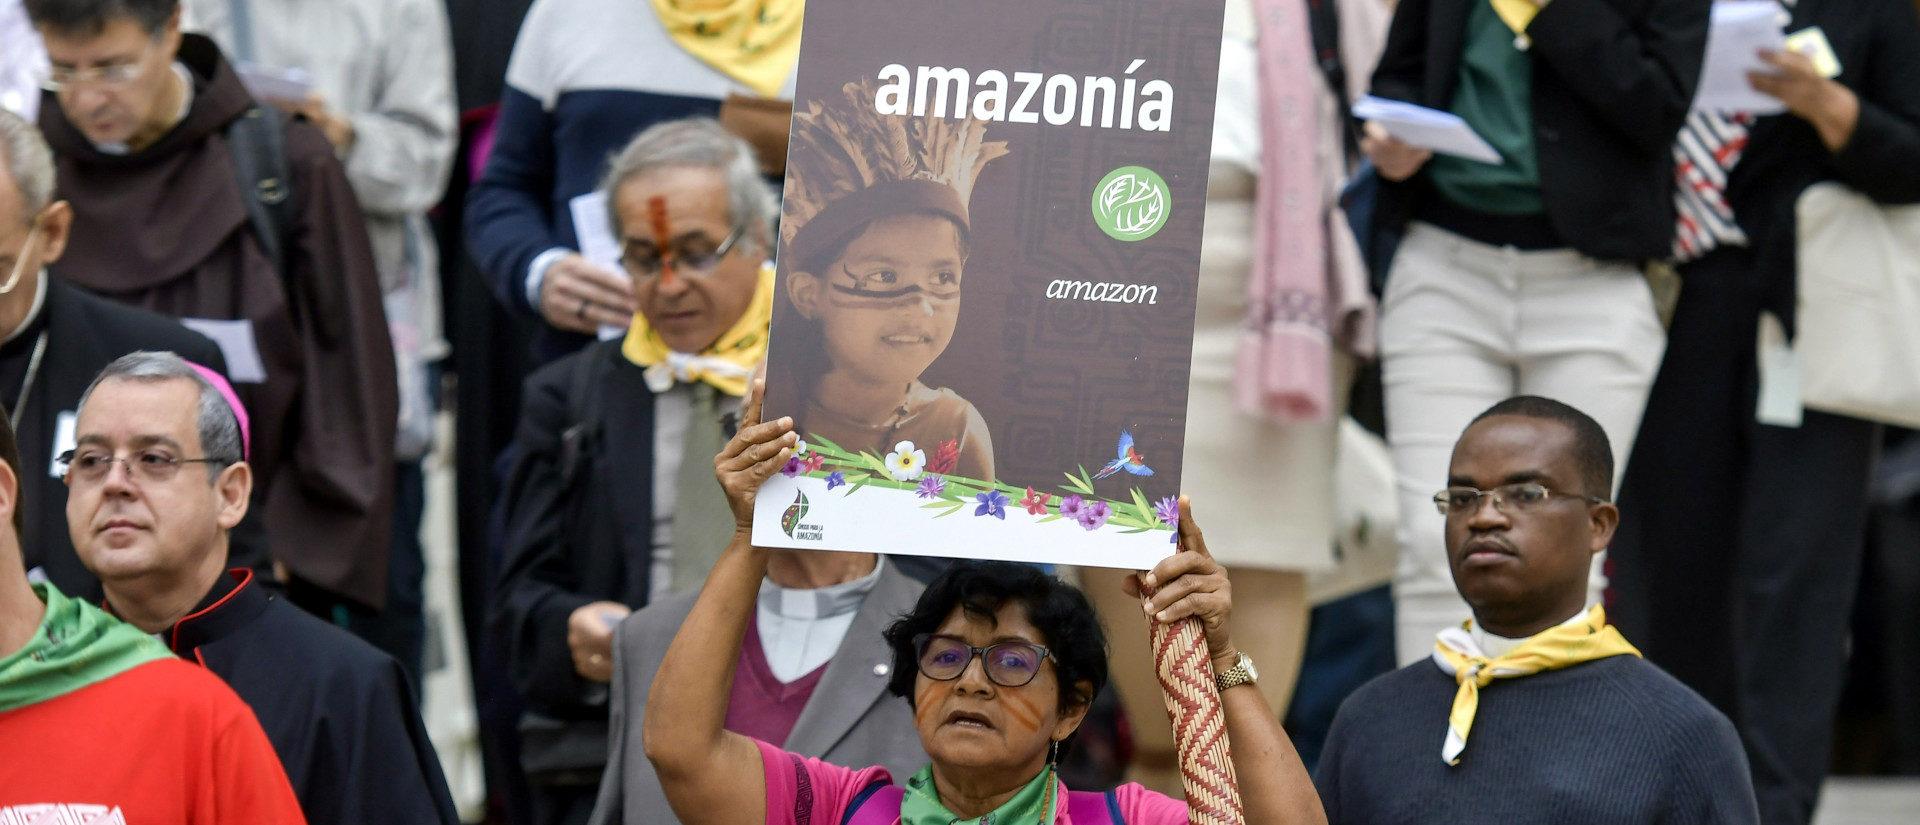 Teilnehmer an der Amazonas-Bischofssynode 2019.   ©KNA